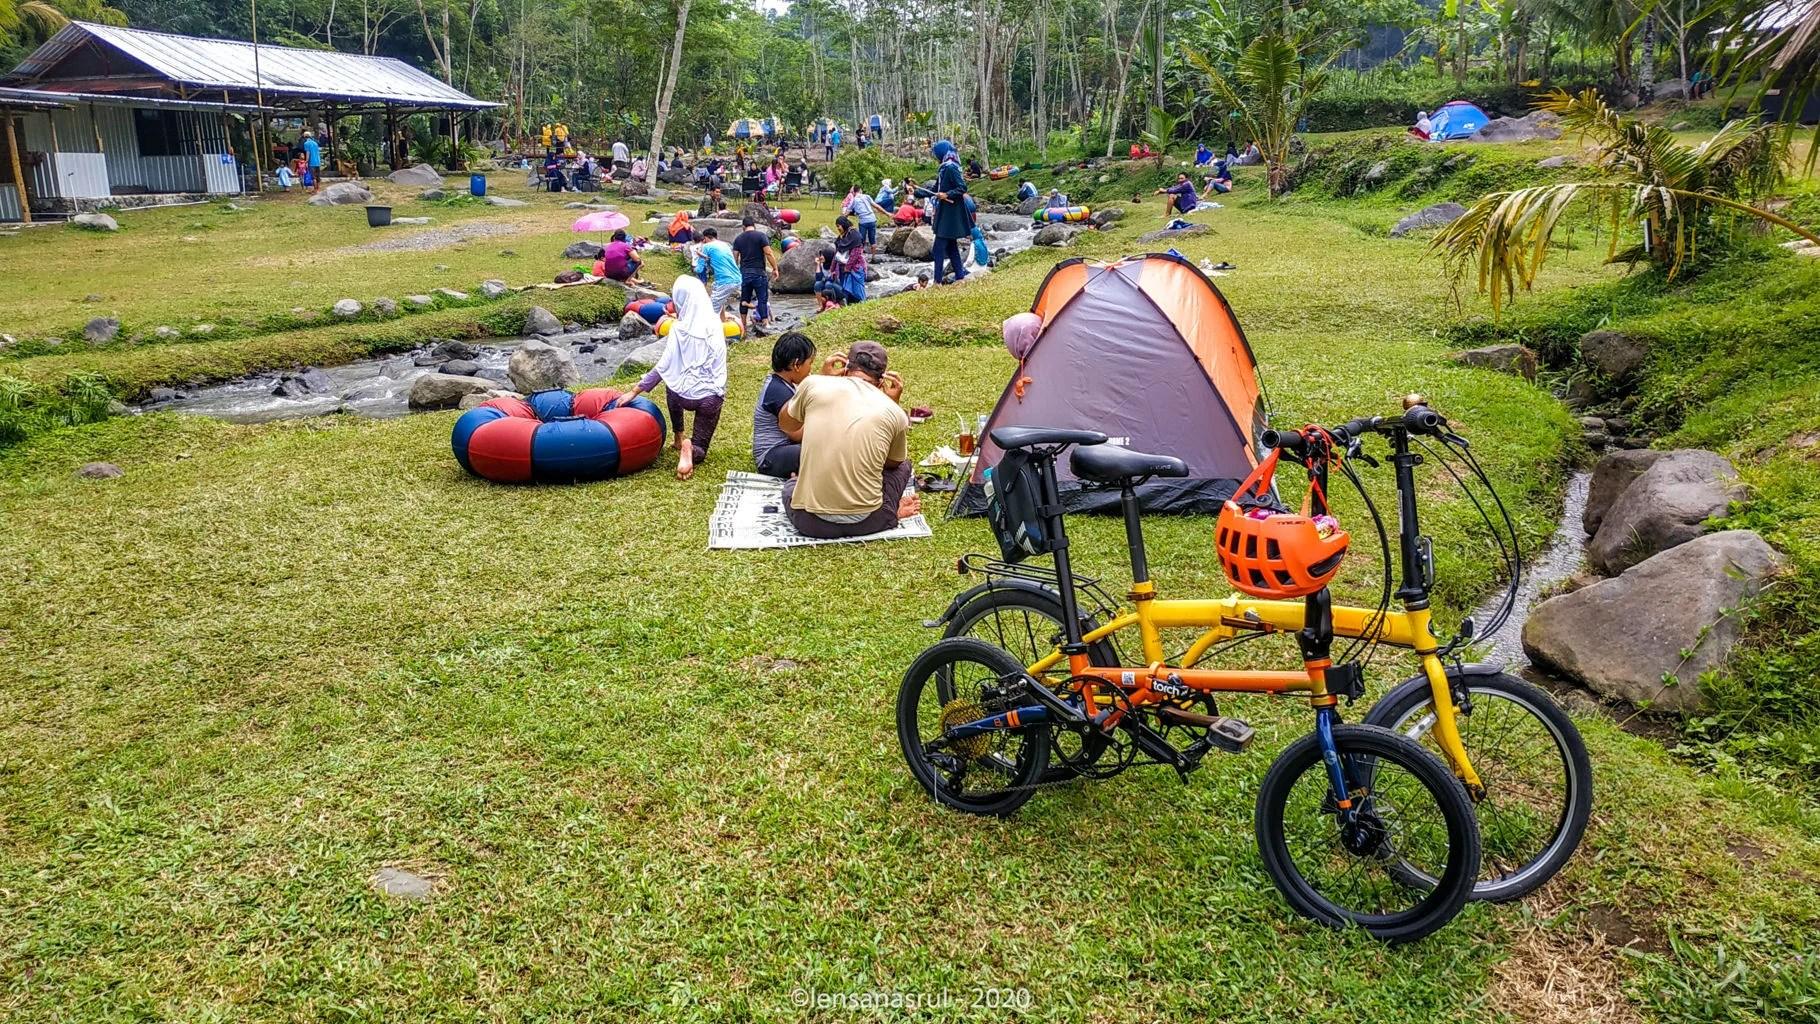 Habis Gowes Menikmati Wisata Alam Ledok Sambi Kaliurang Yogyakarta